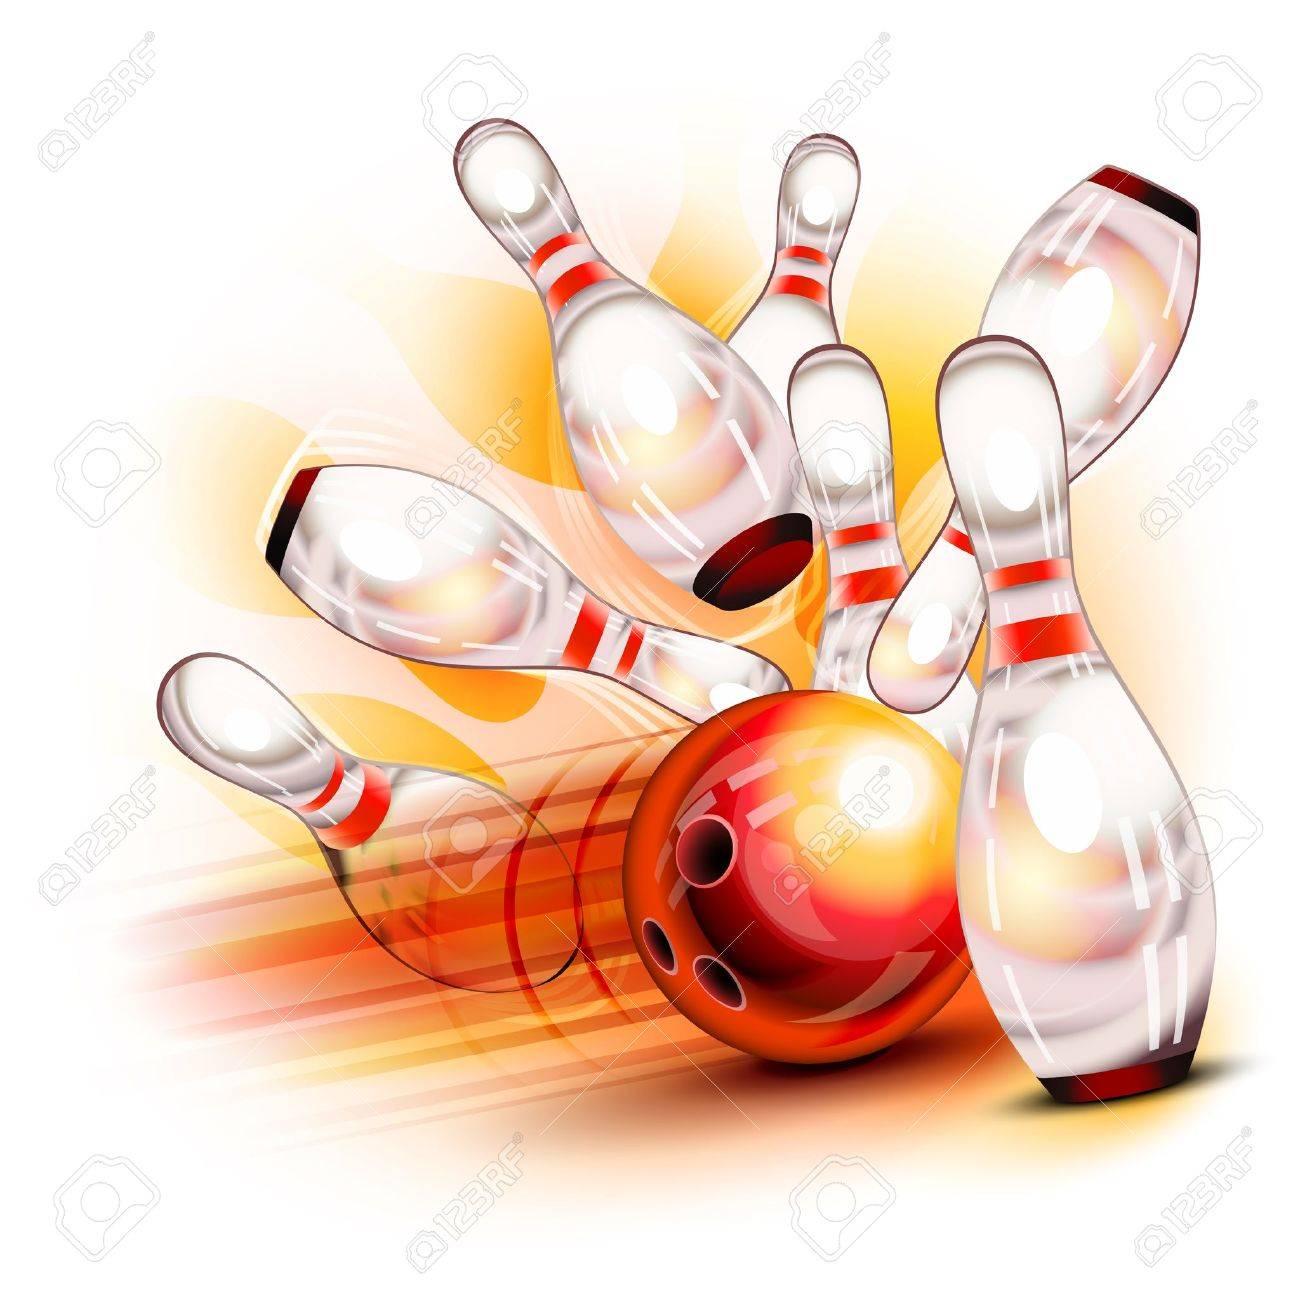 A red bowling ball crashing into the shiny pins - 17885624